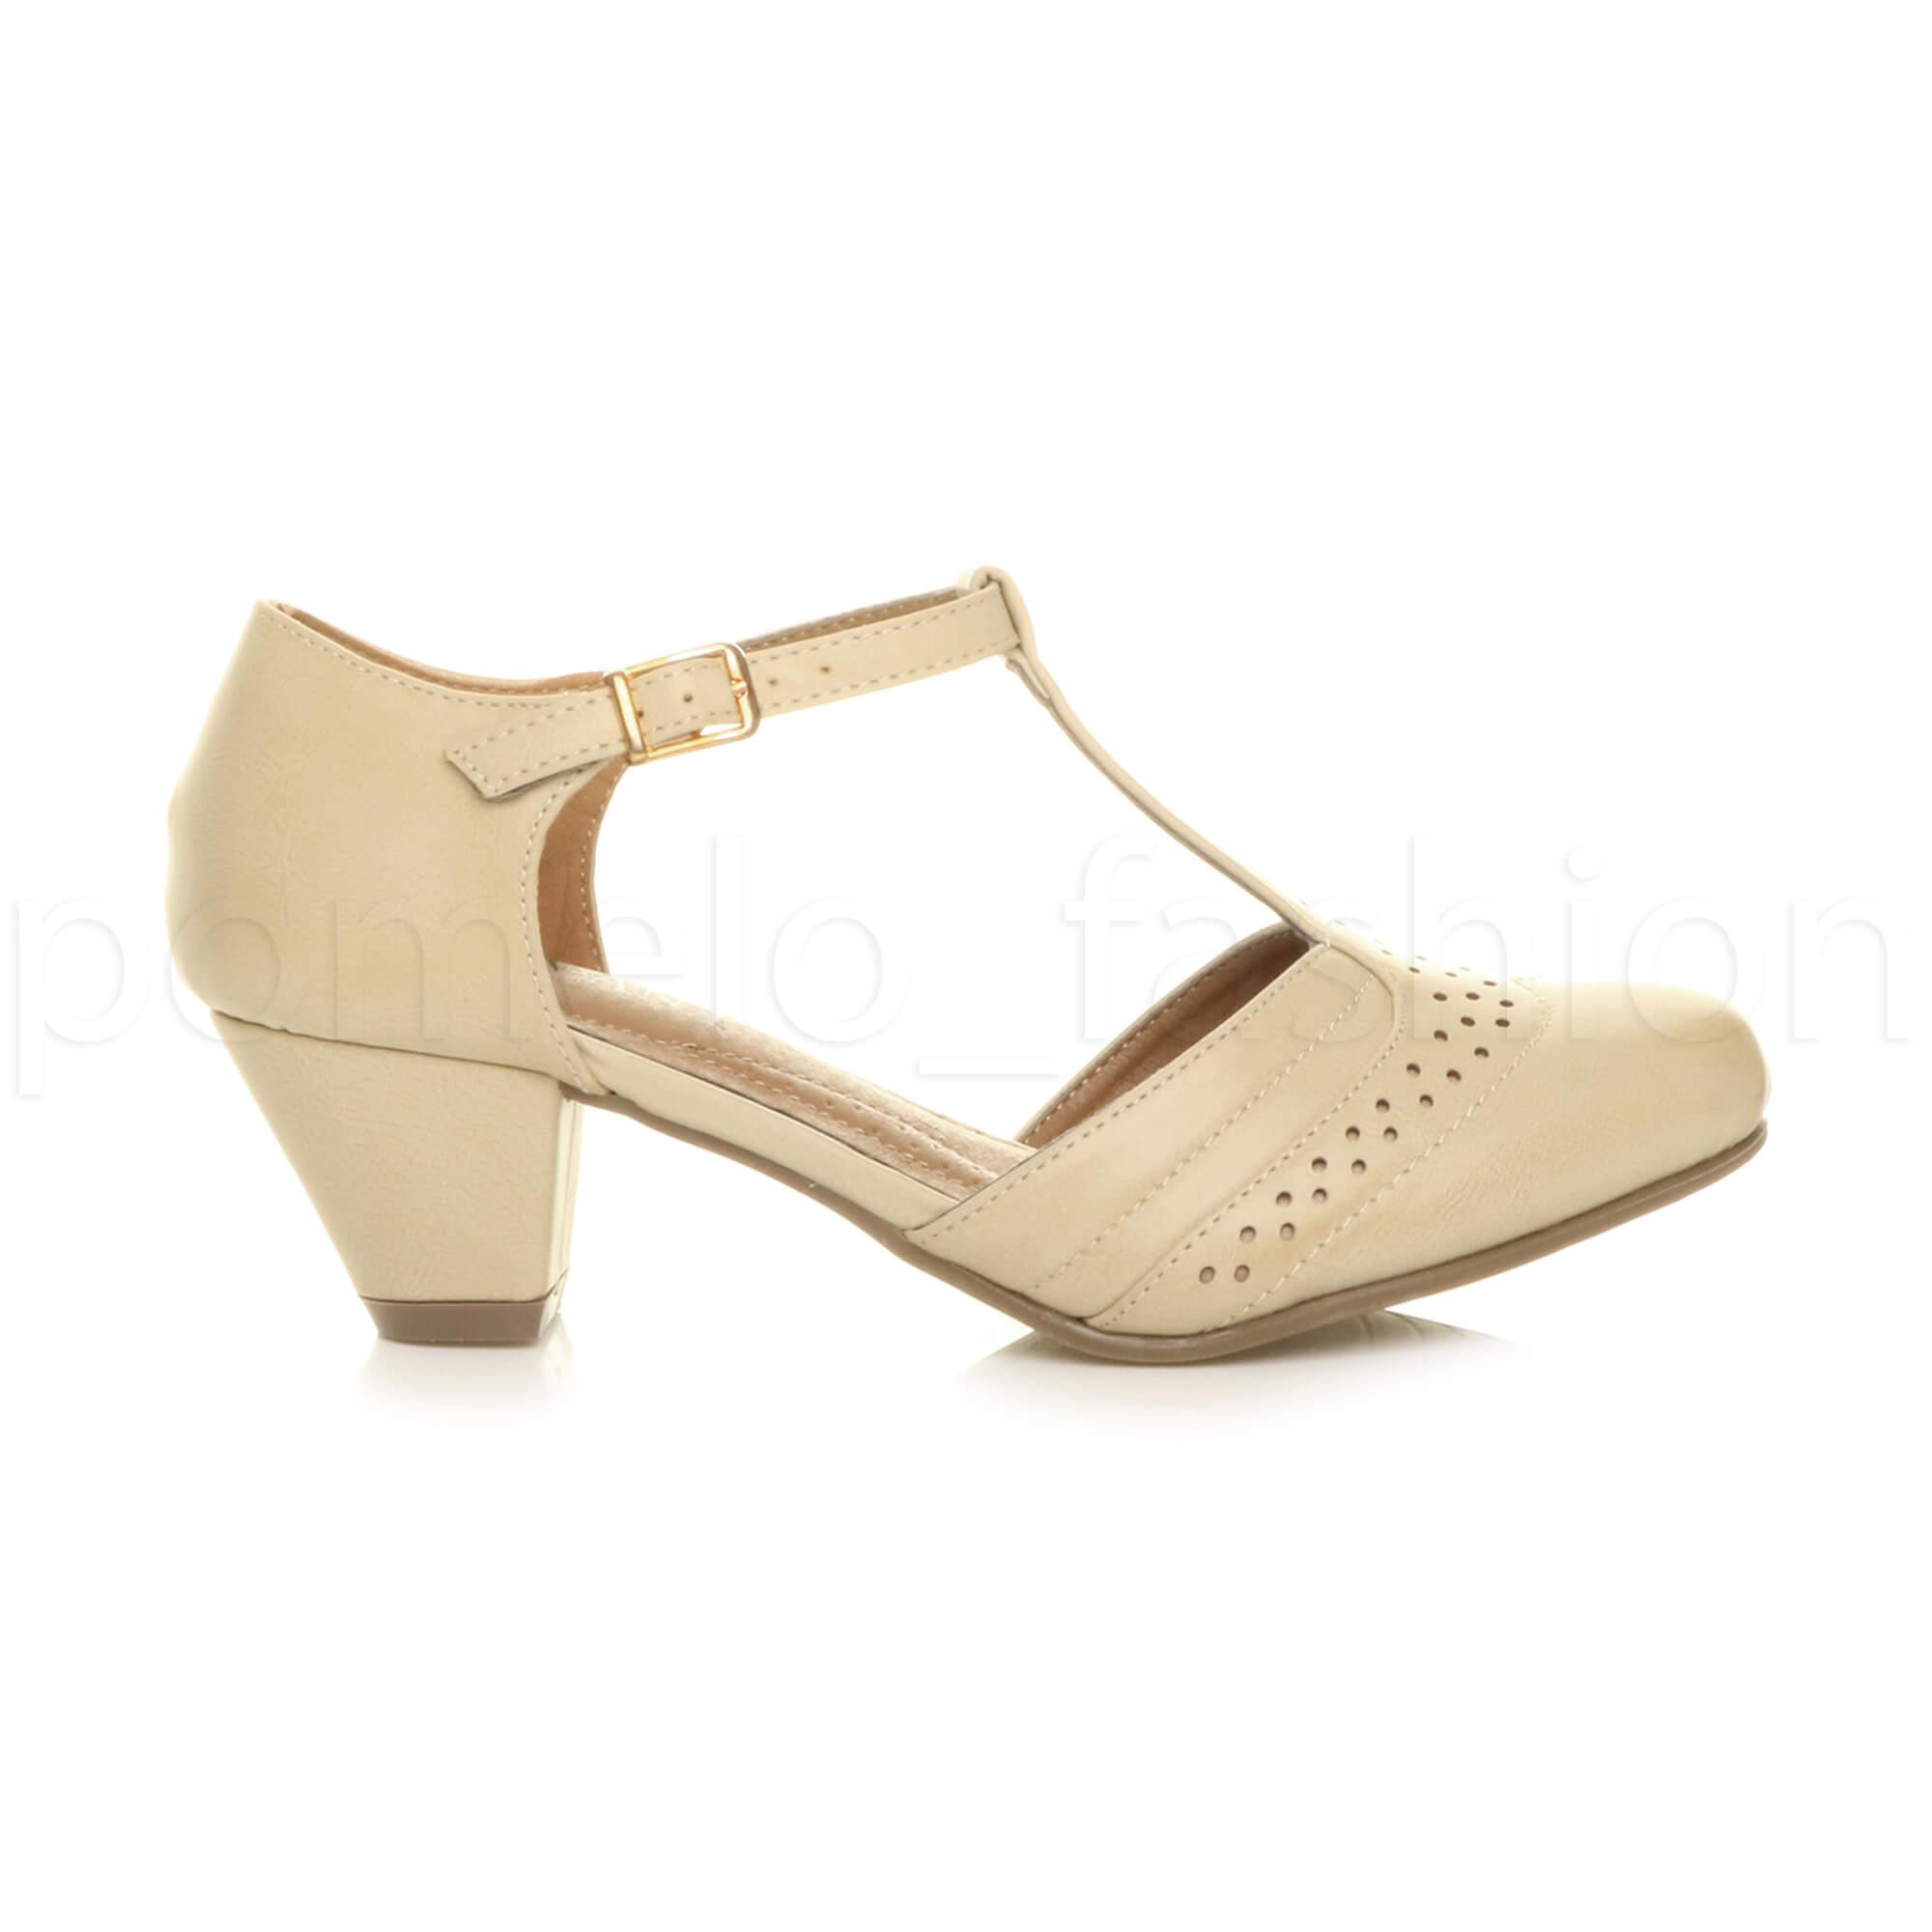 Brogues Womens Navy Shoes Mid Heel